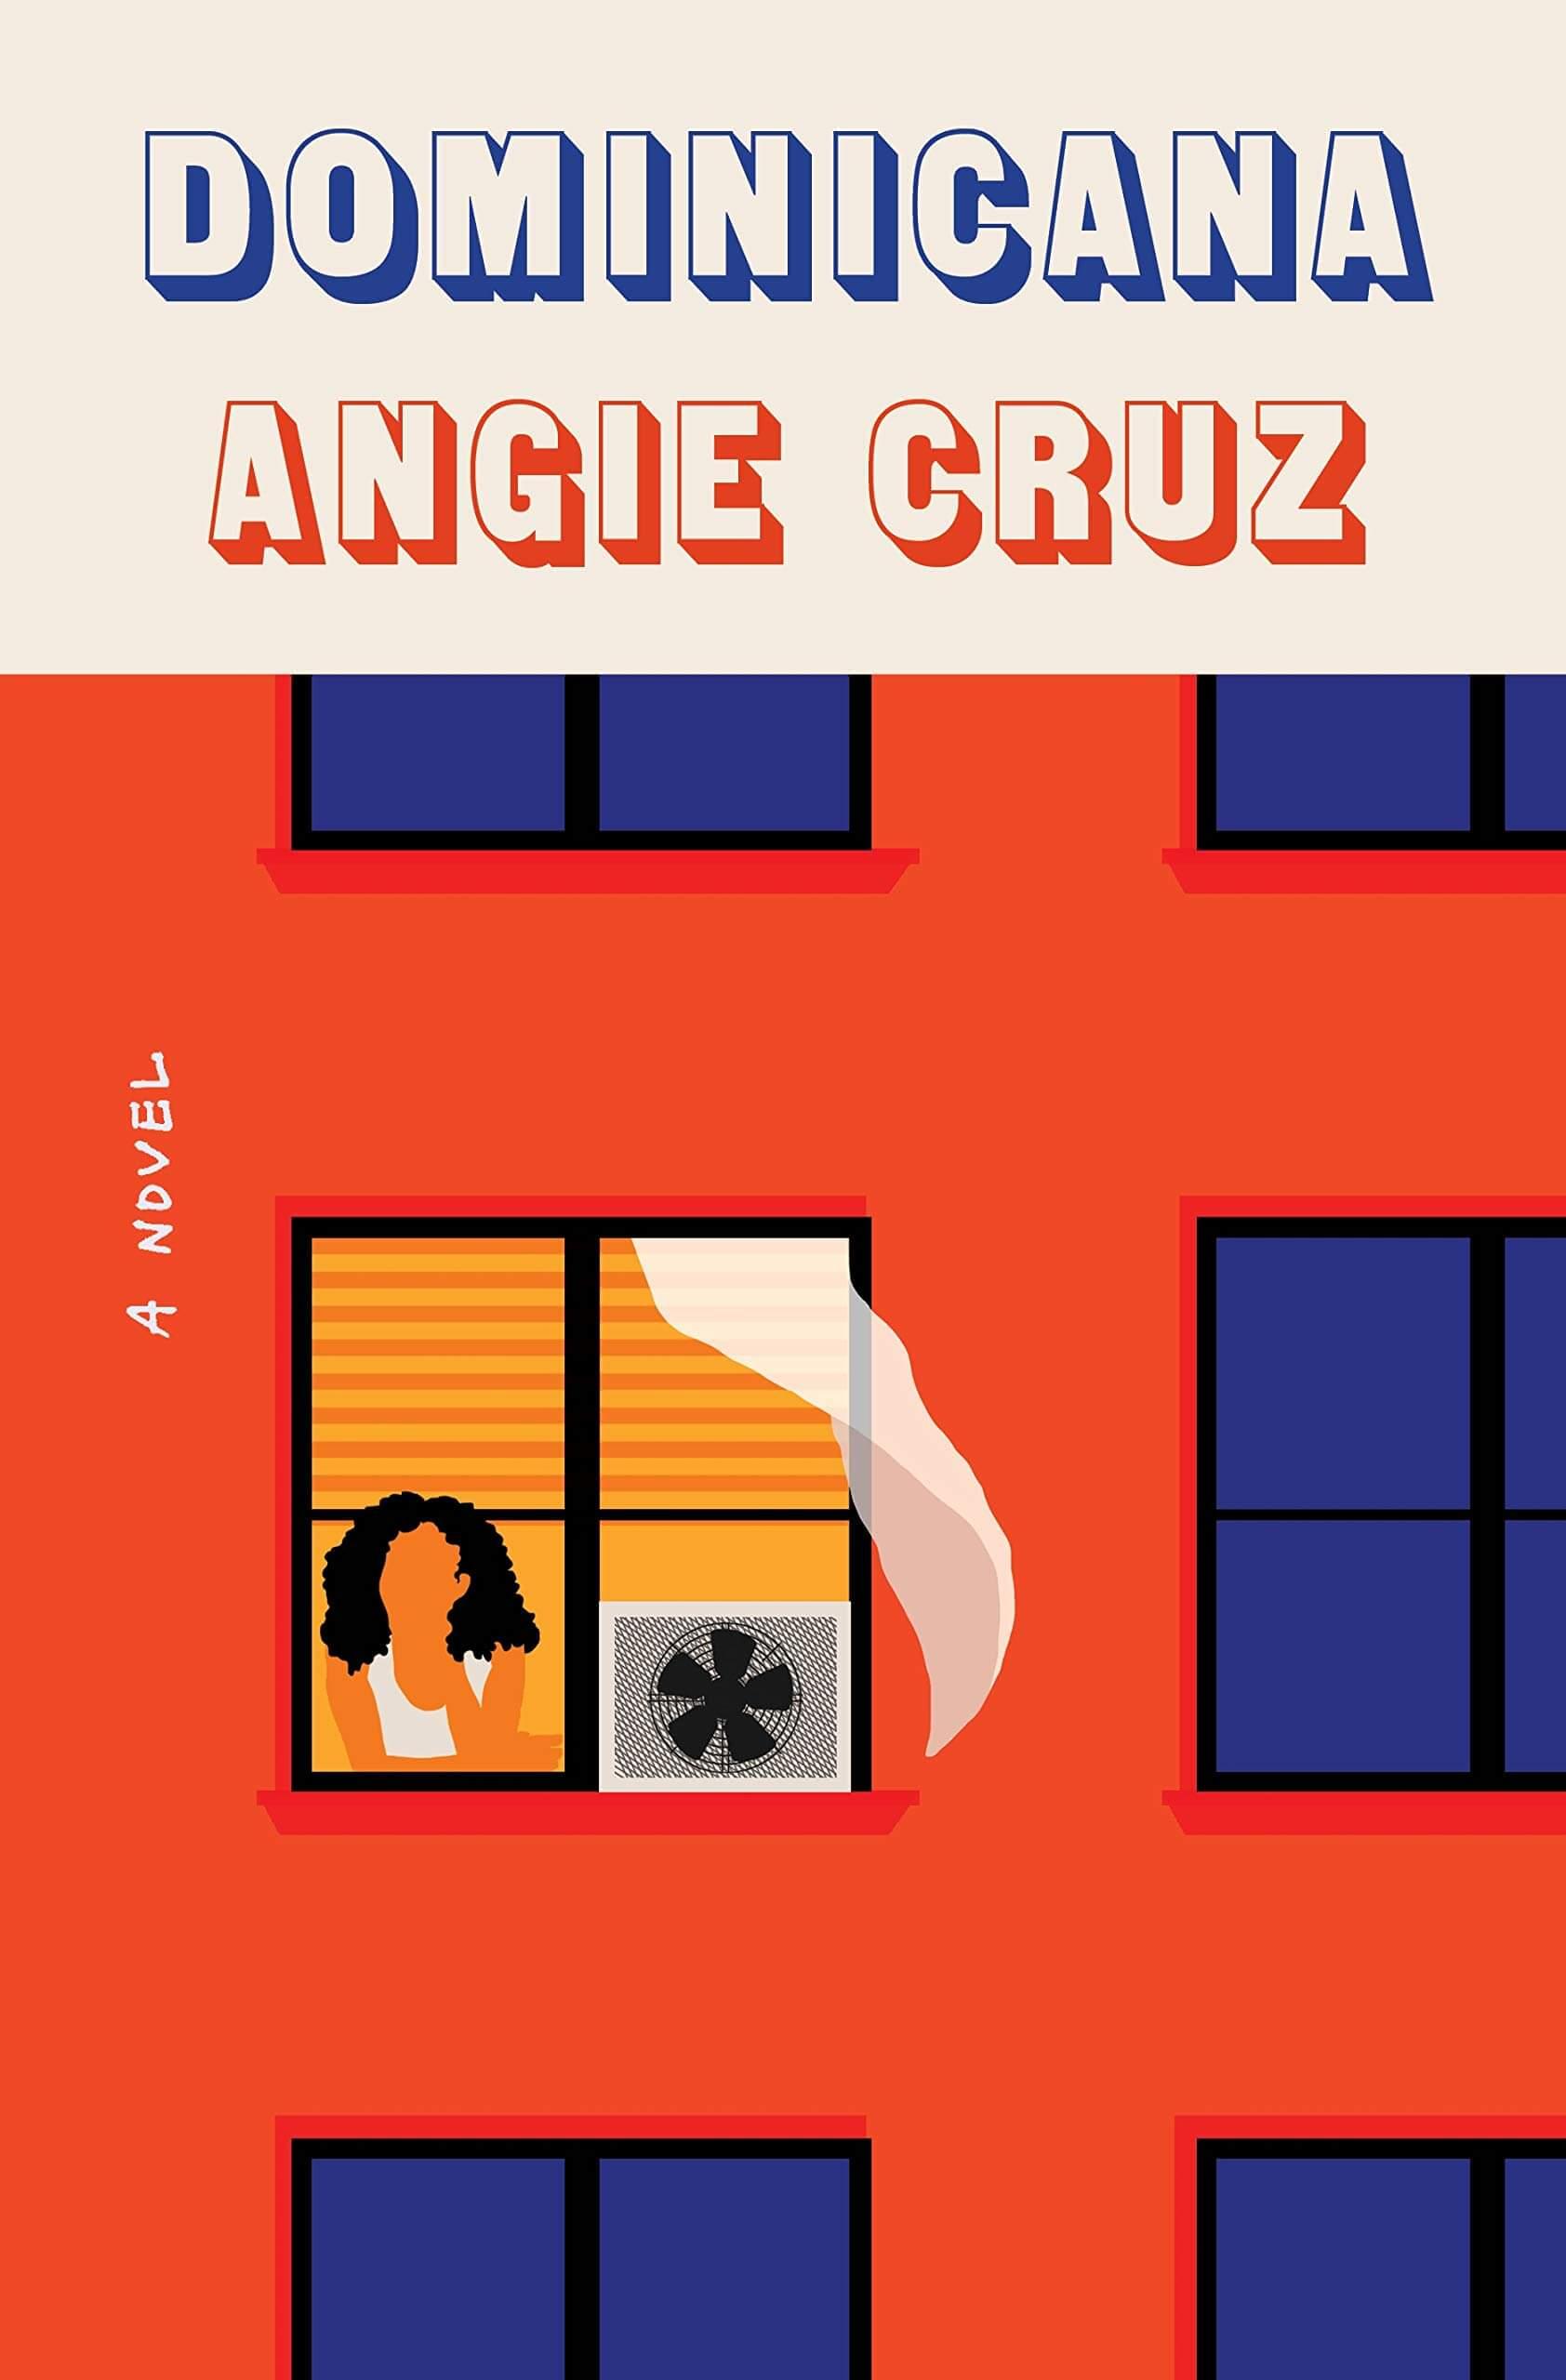 Dominicana book cover image